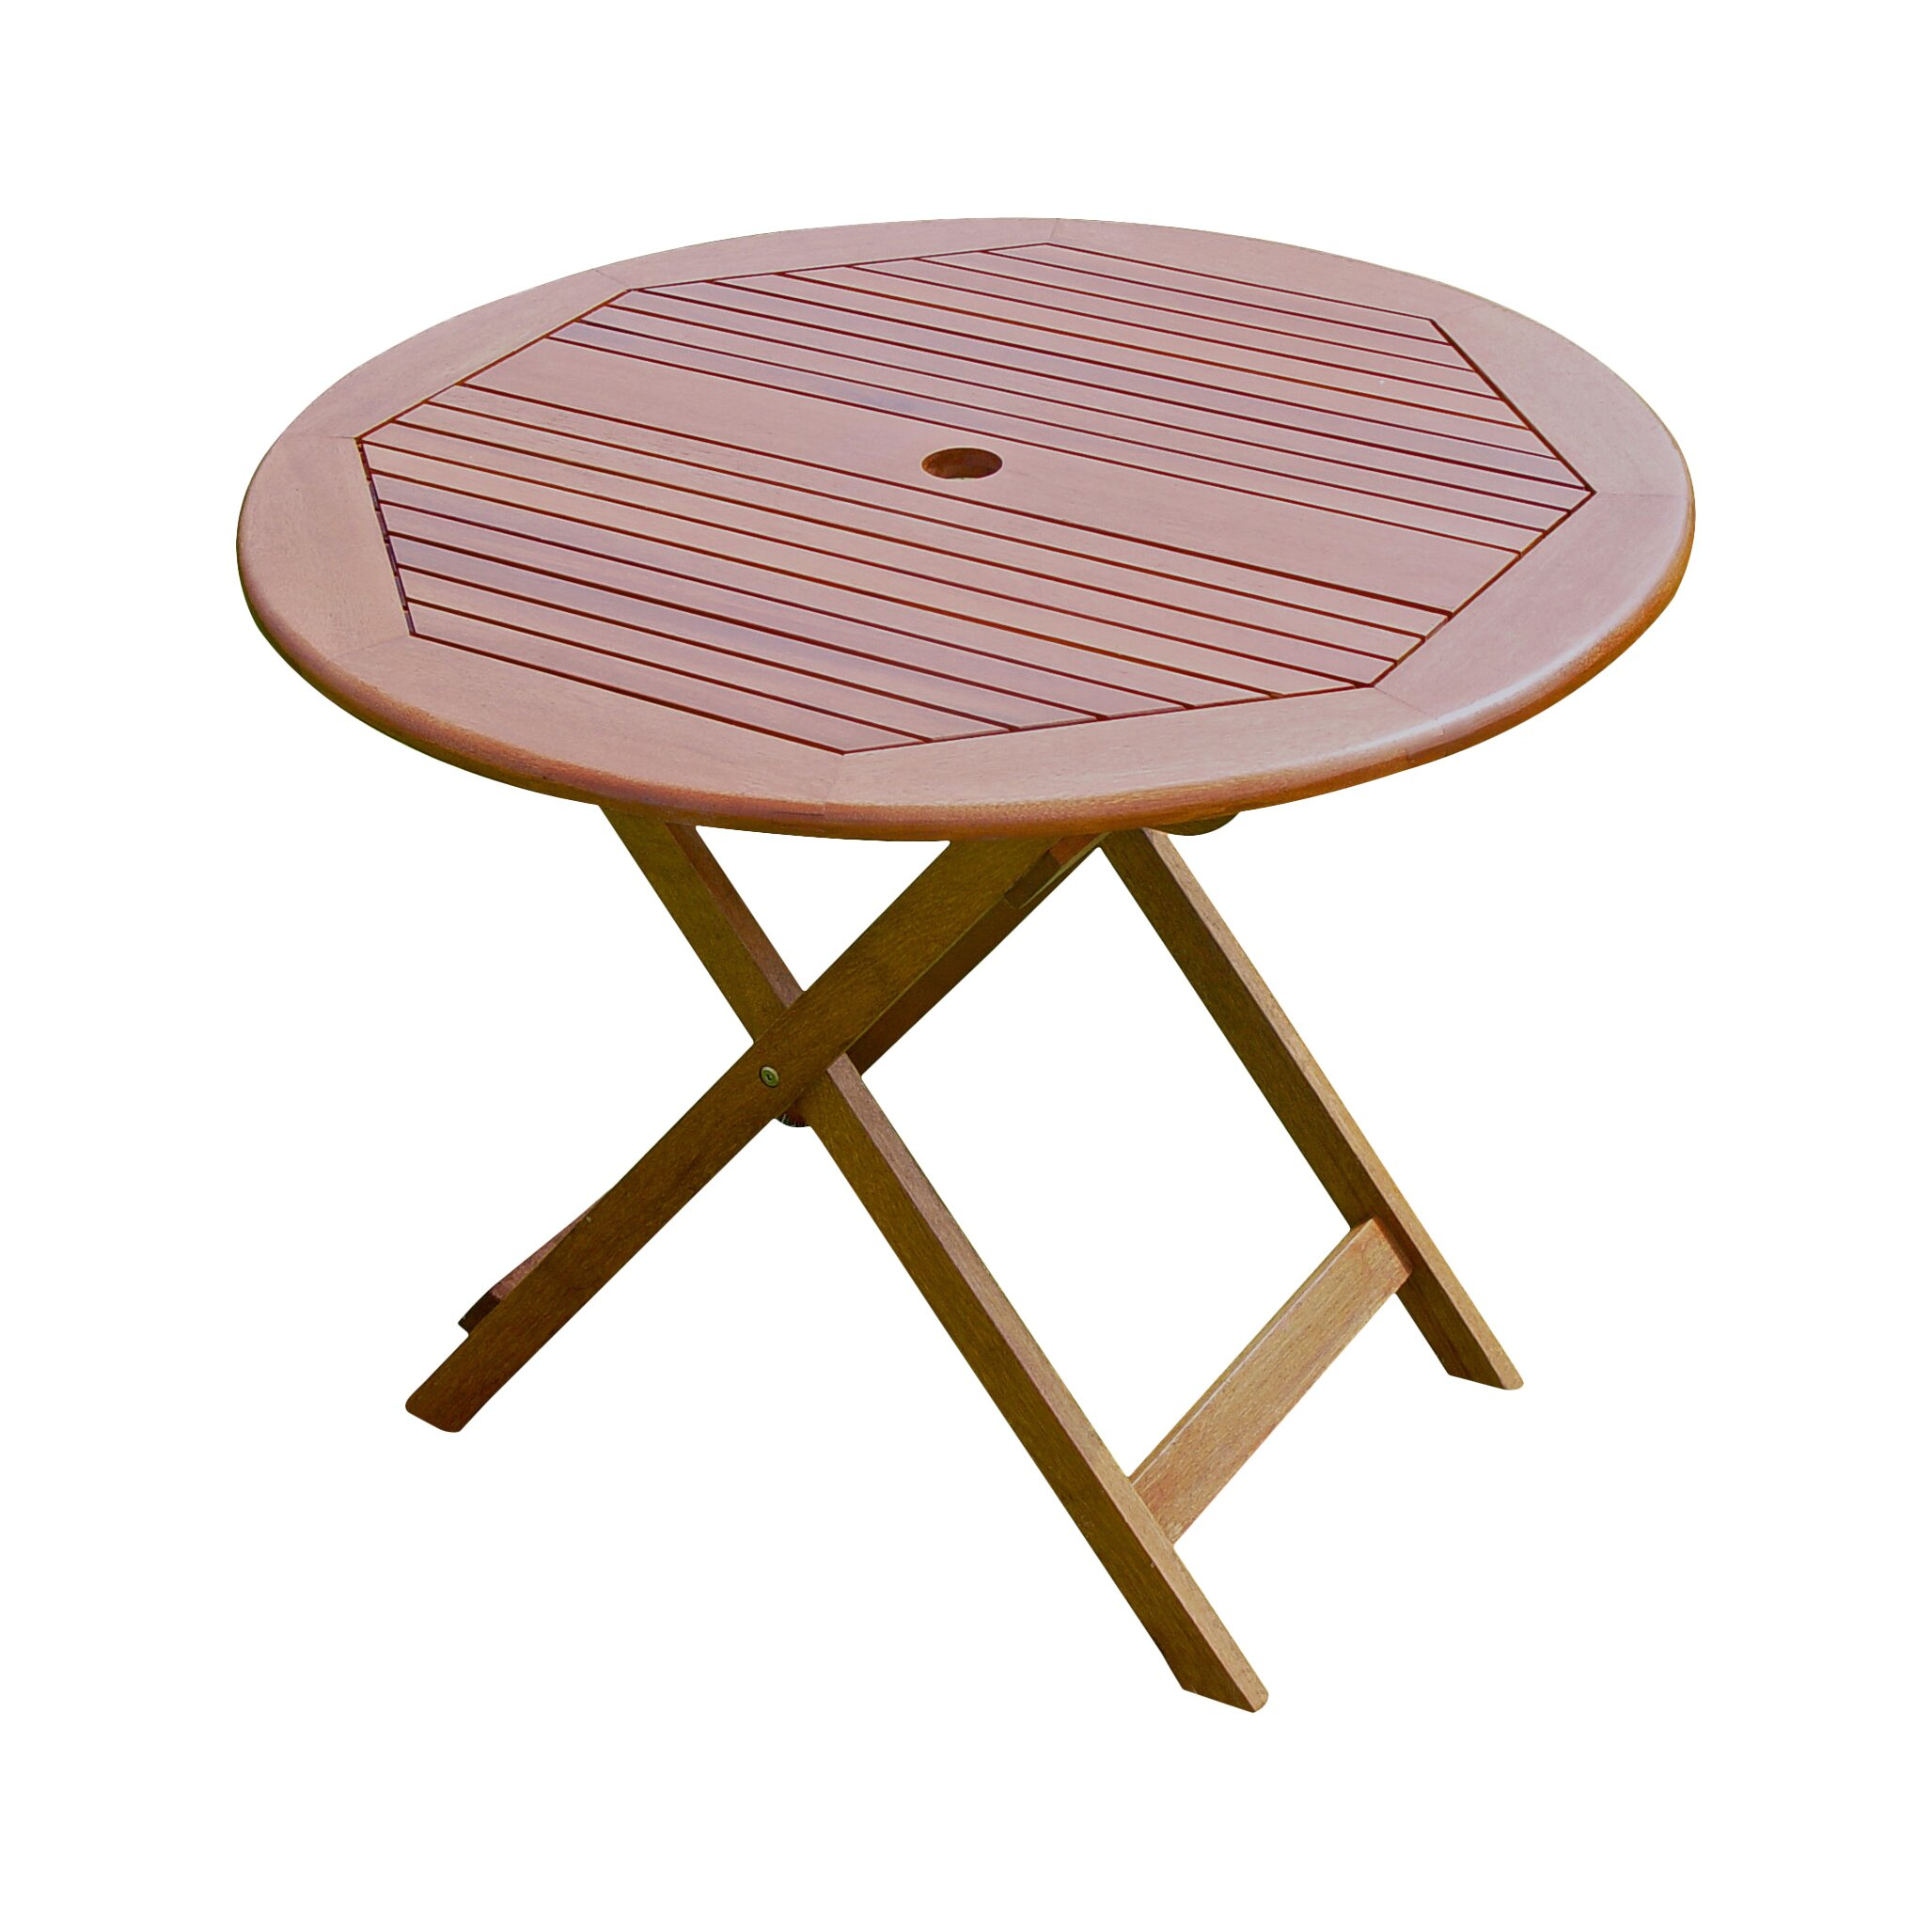 Stunning Folding Outdoor Dining Table Pics Designs – Dievoon